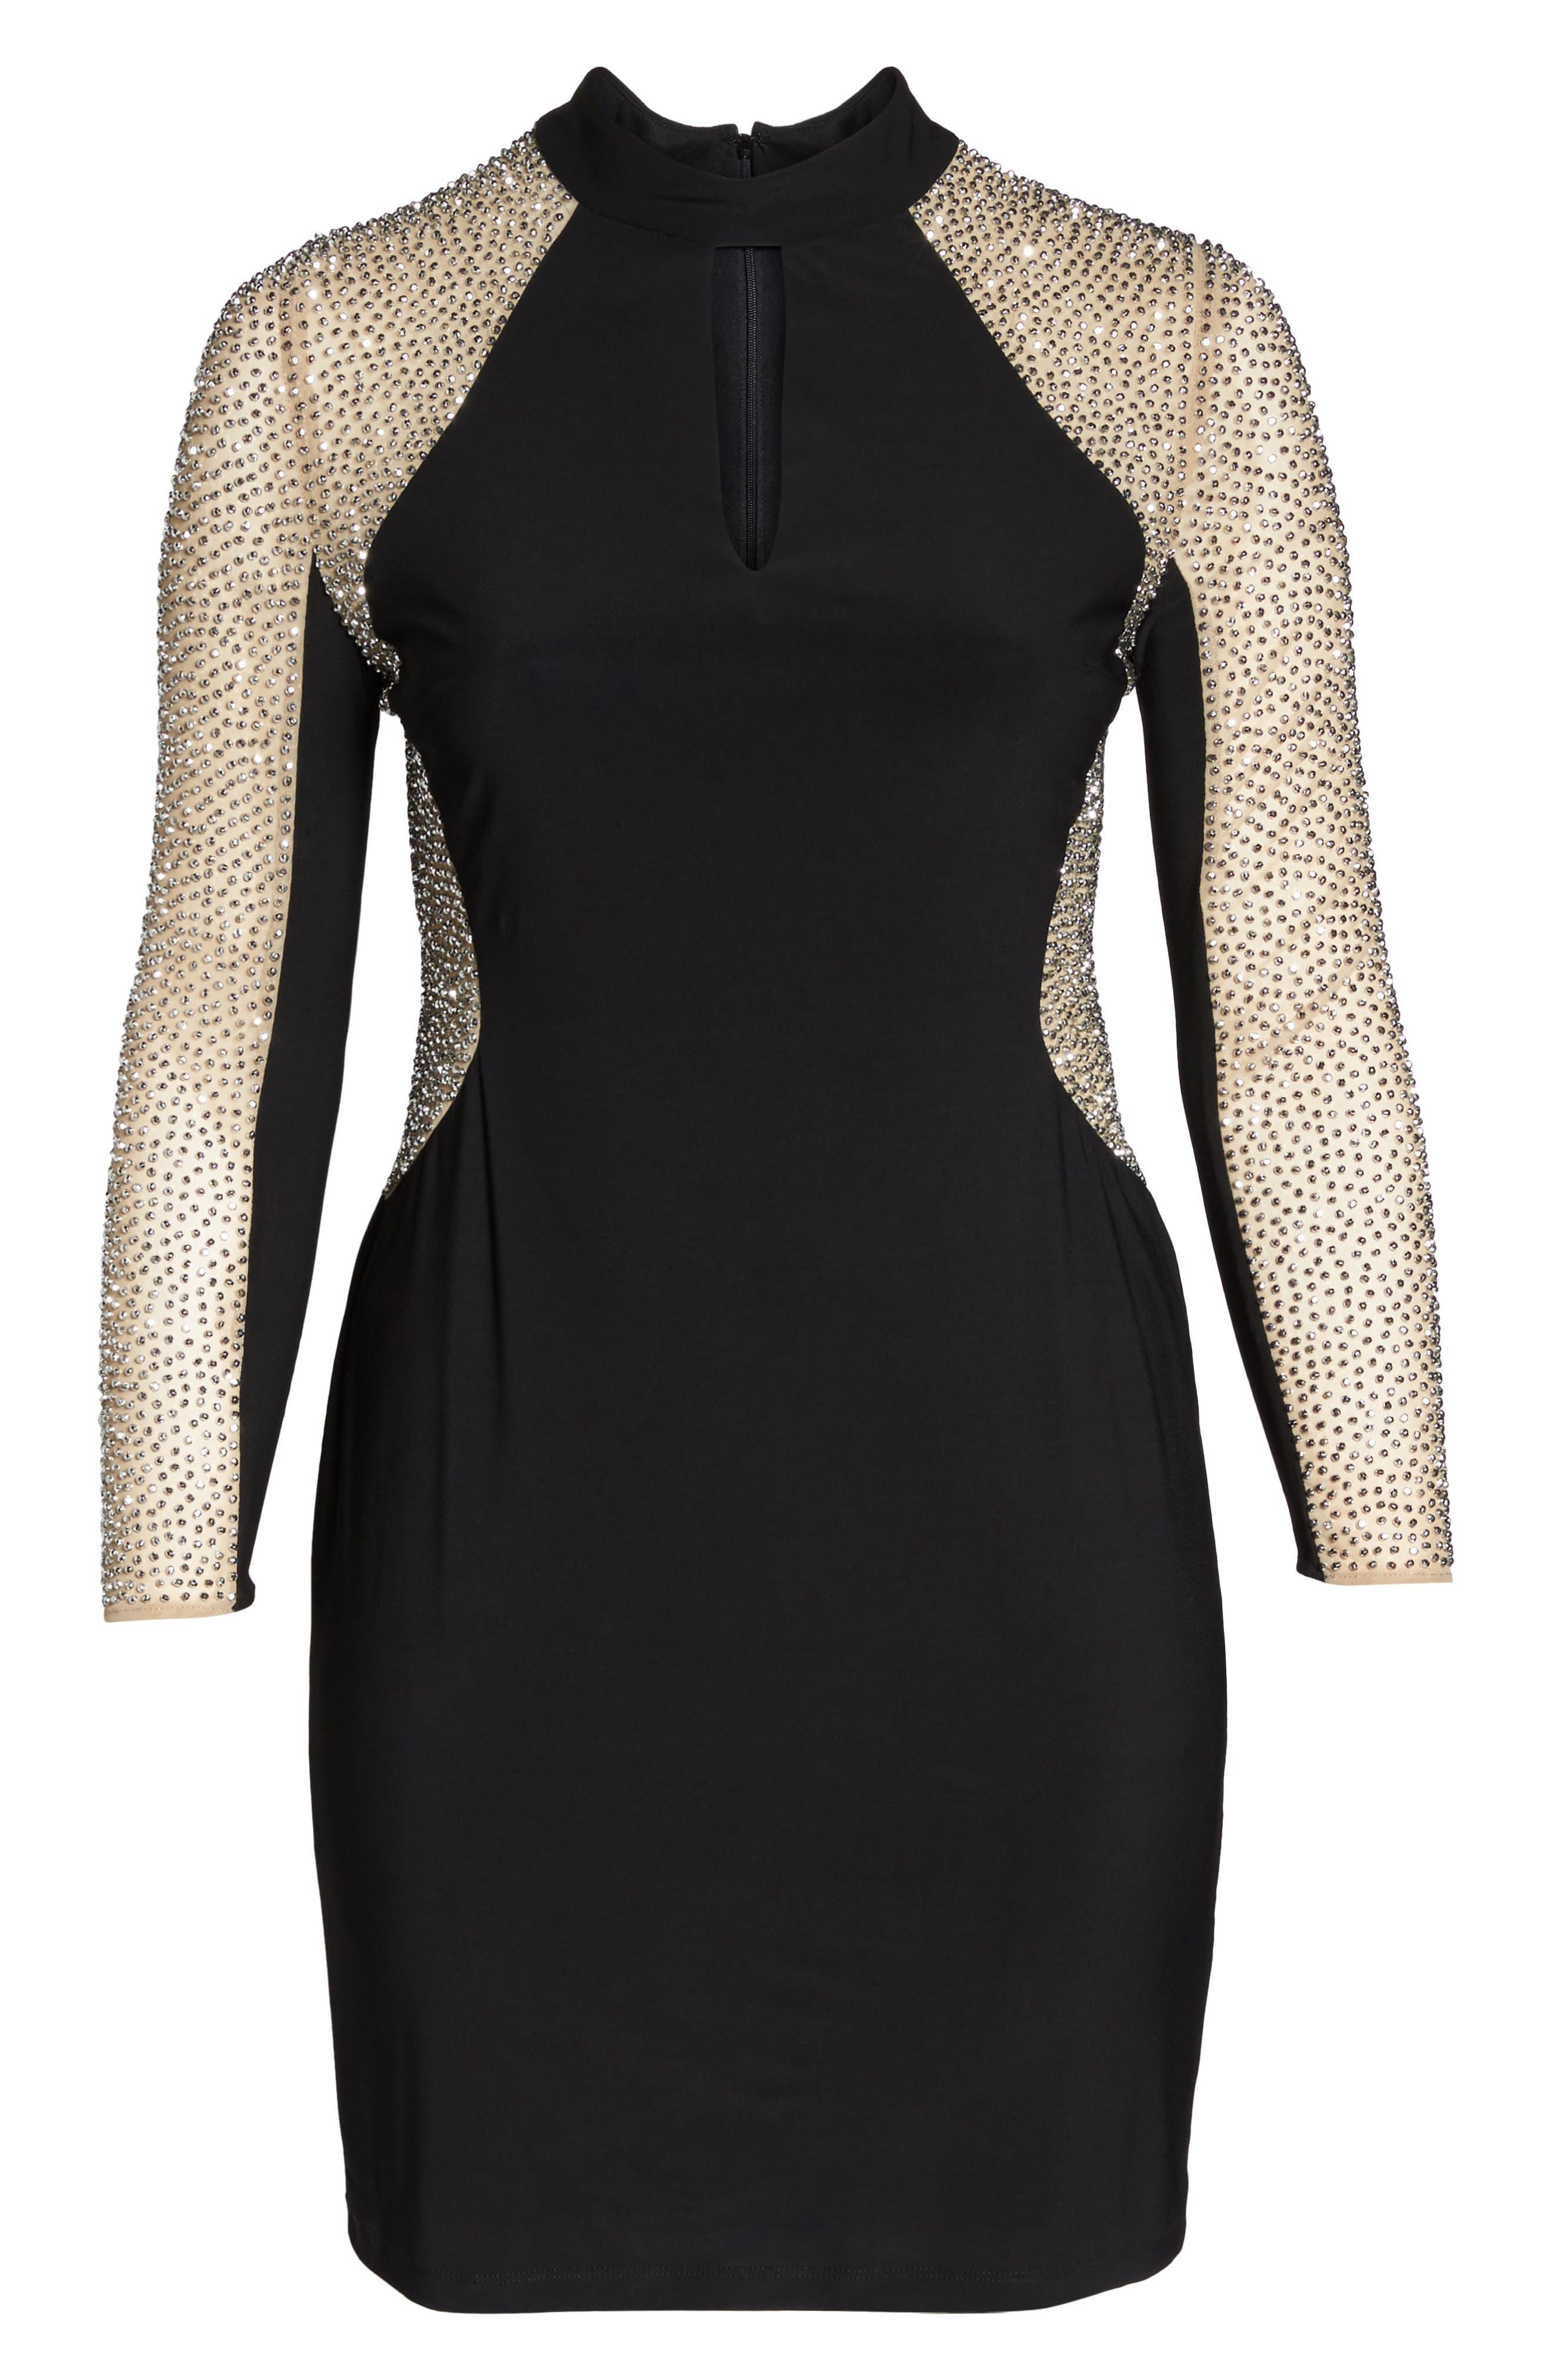 Caviar Beading Keyhole Dress,                             Alternate thumbnail 6, color,                             Black/ Nude/ Silver